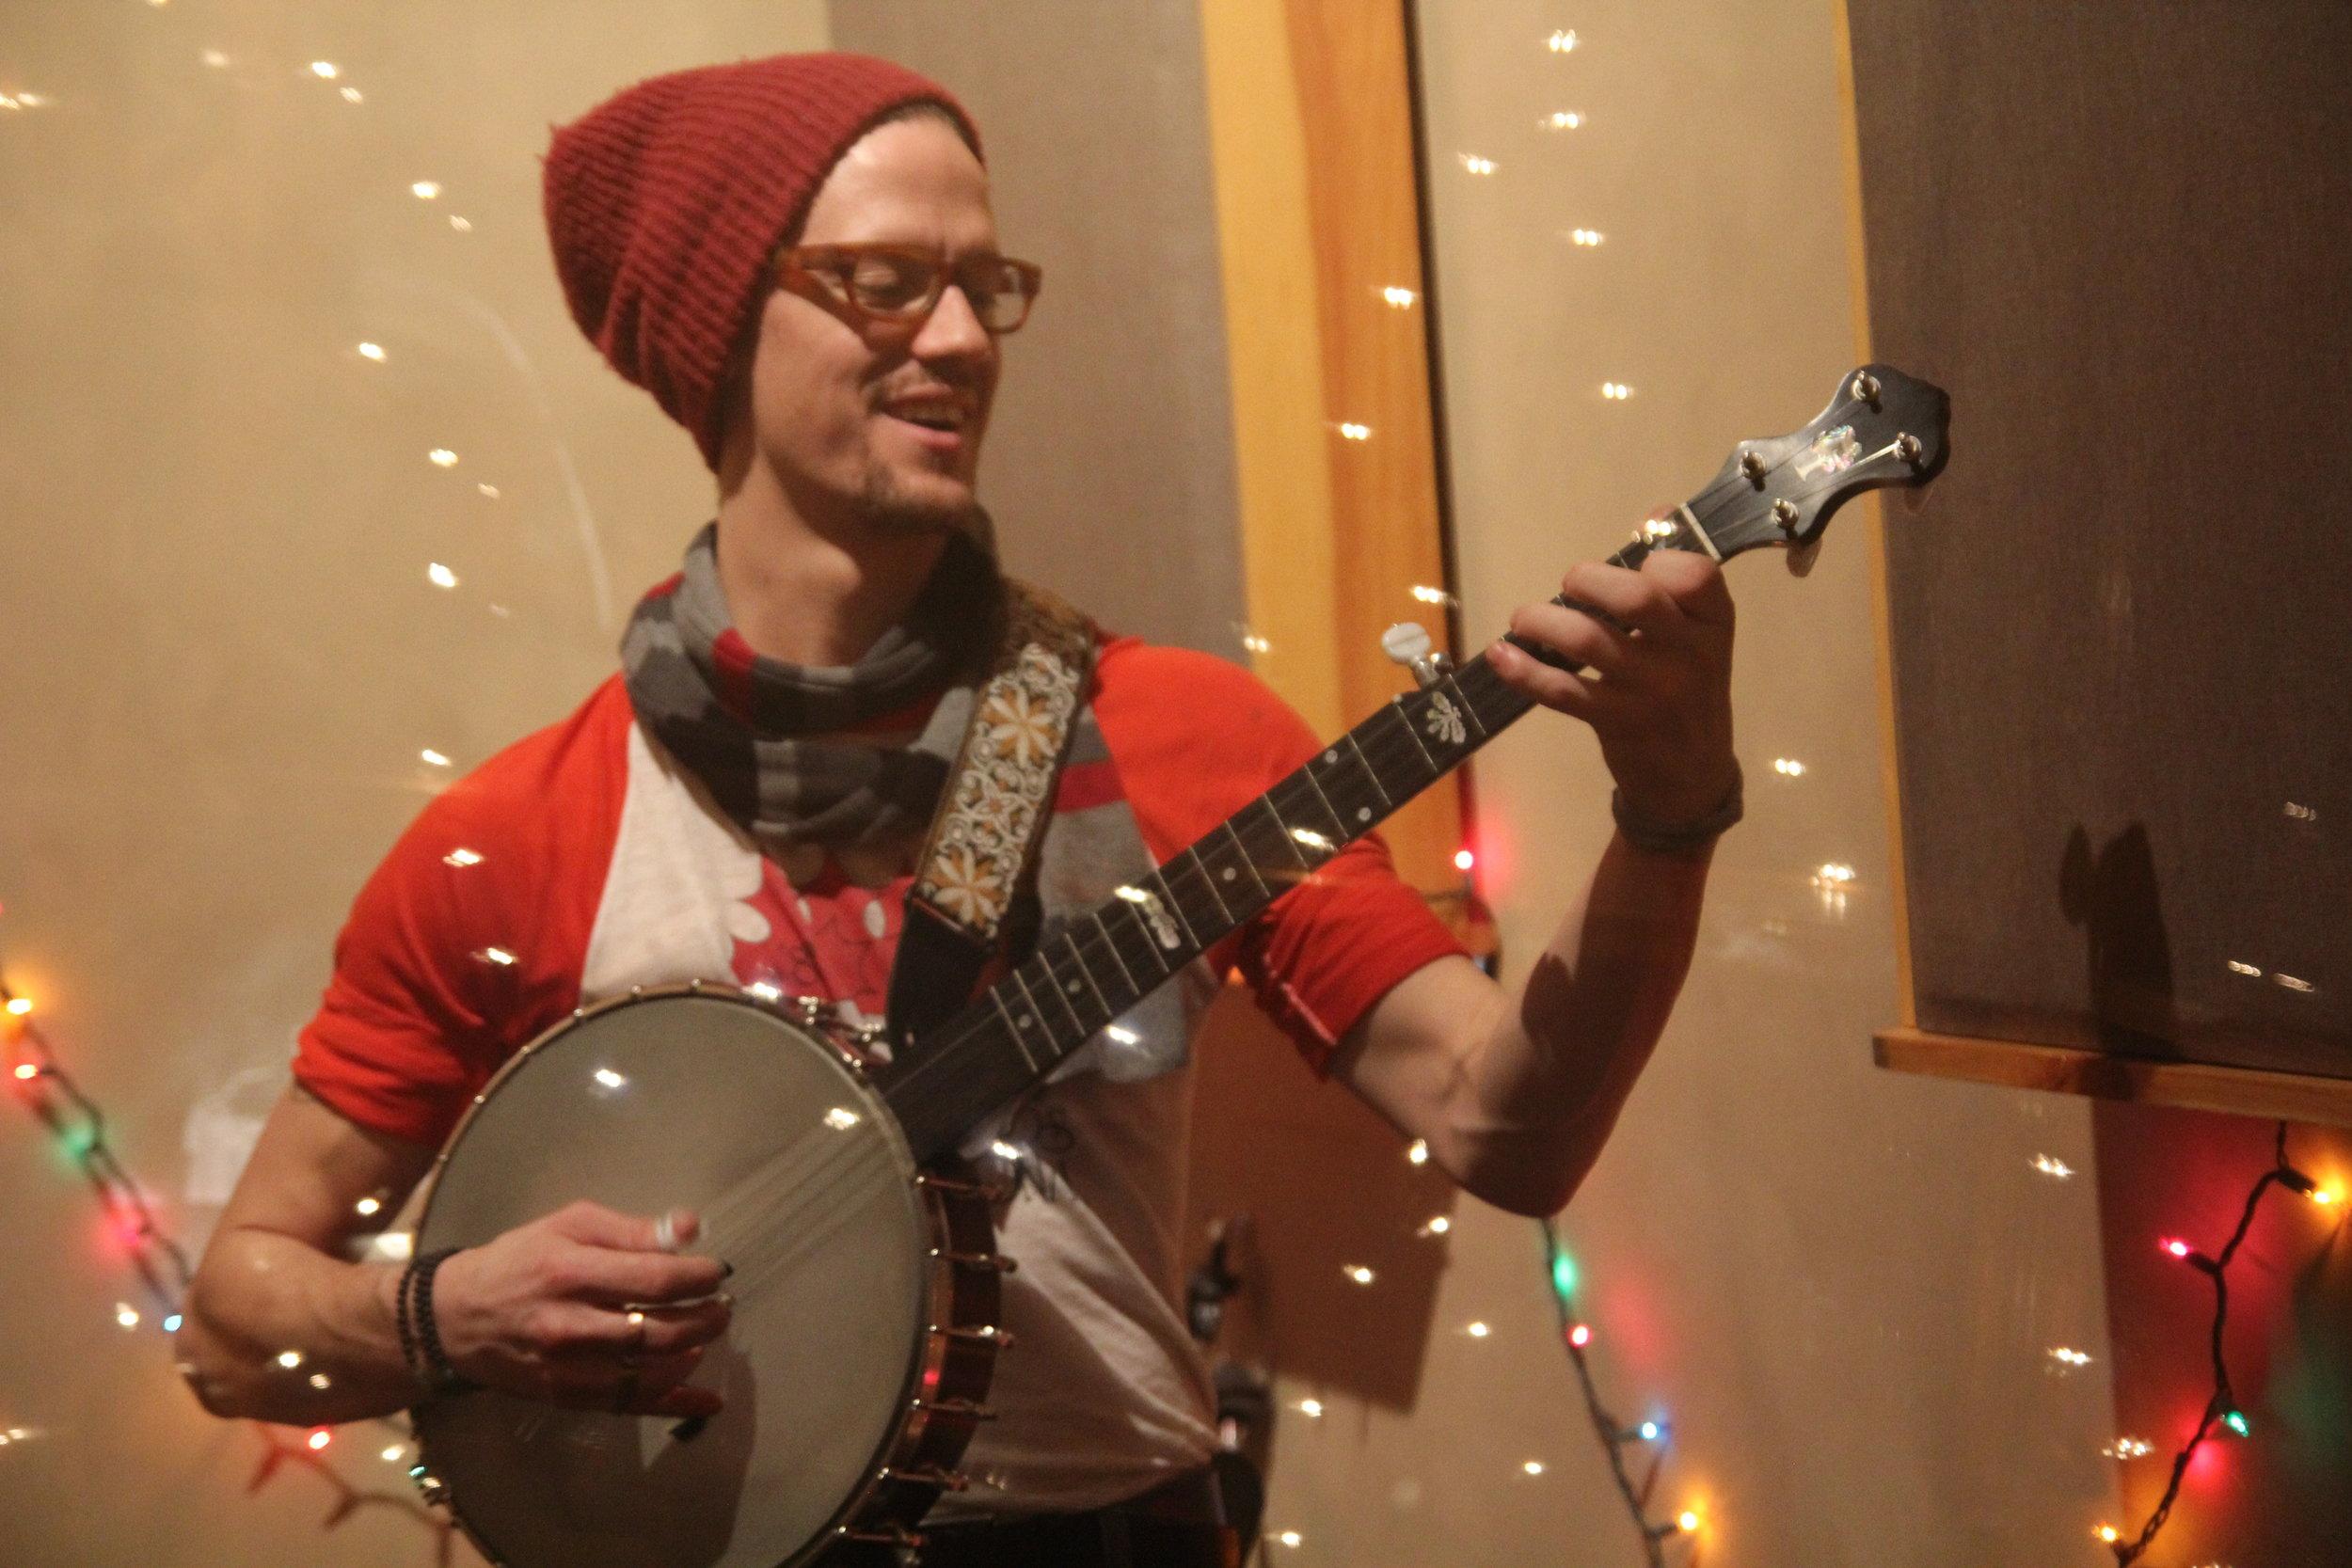 Daniel Kwiatkowski (DK) - Banjo and Electric Guitar. From Cheboygan, Michigan b@$*%tches. Likes 🎶🎭🌅✒️🌳🌎🌨🏒👷Timeless dinner attendees: